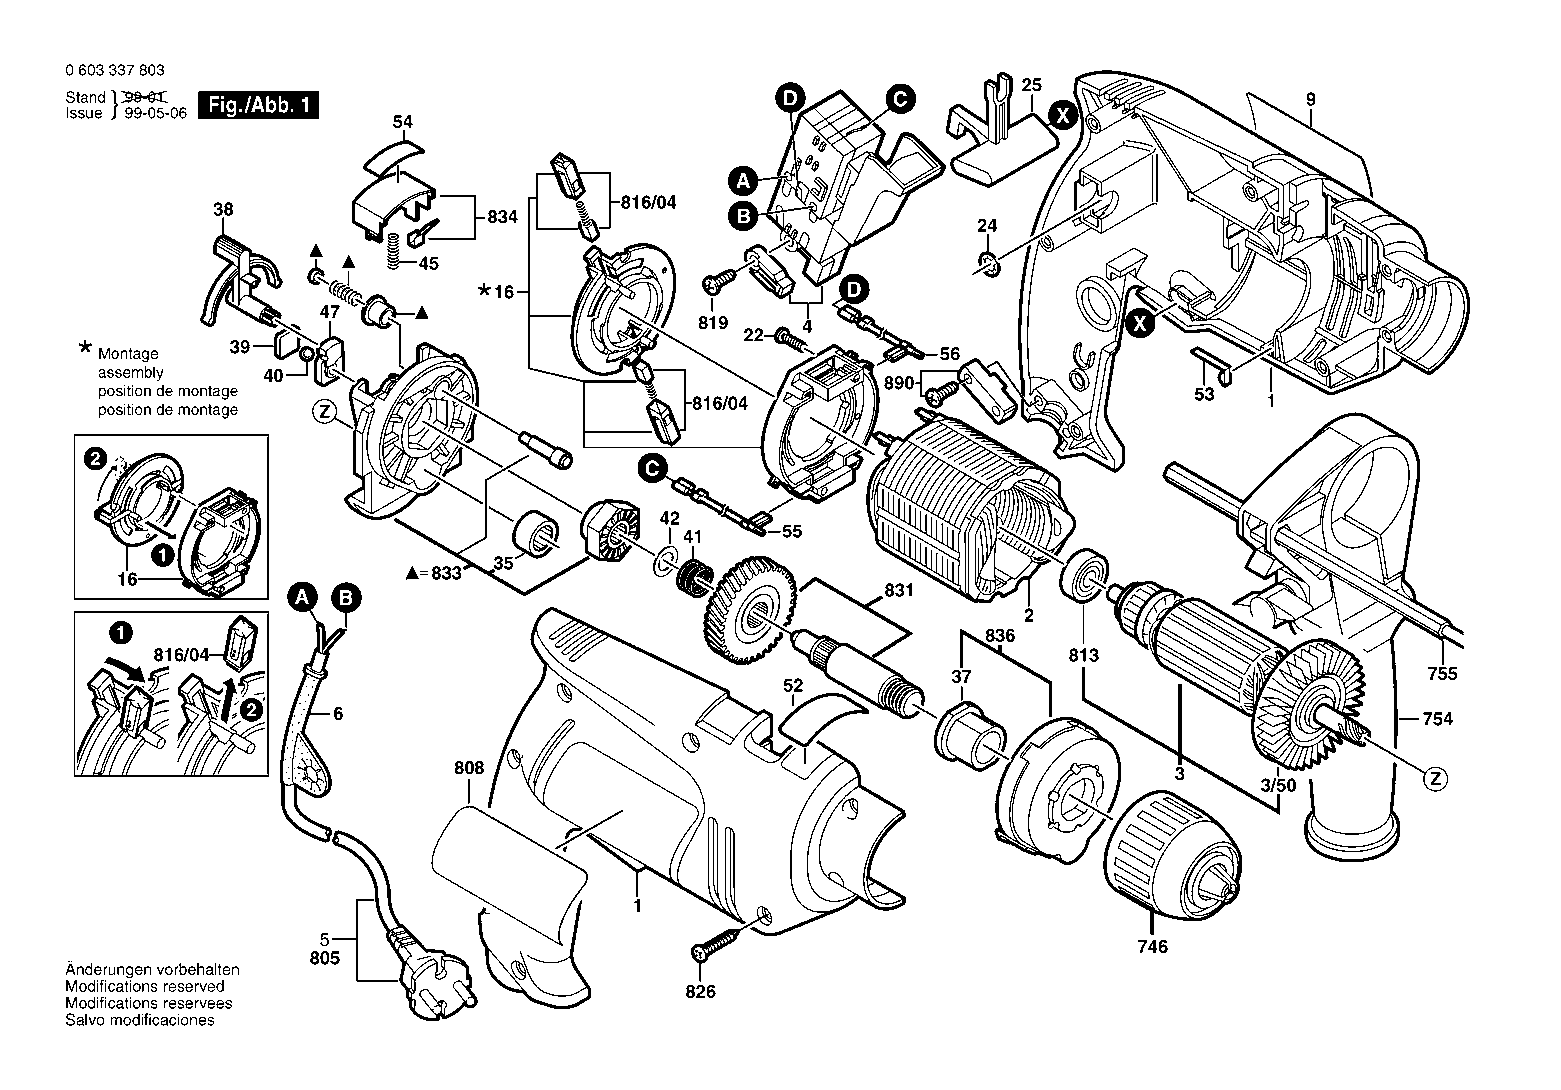 bosch gsb 500 re manual pdf